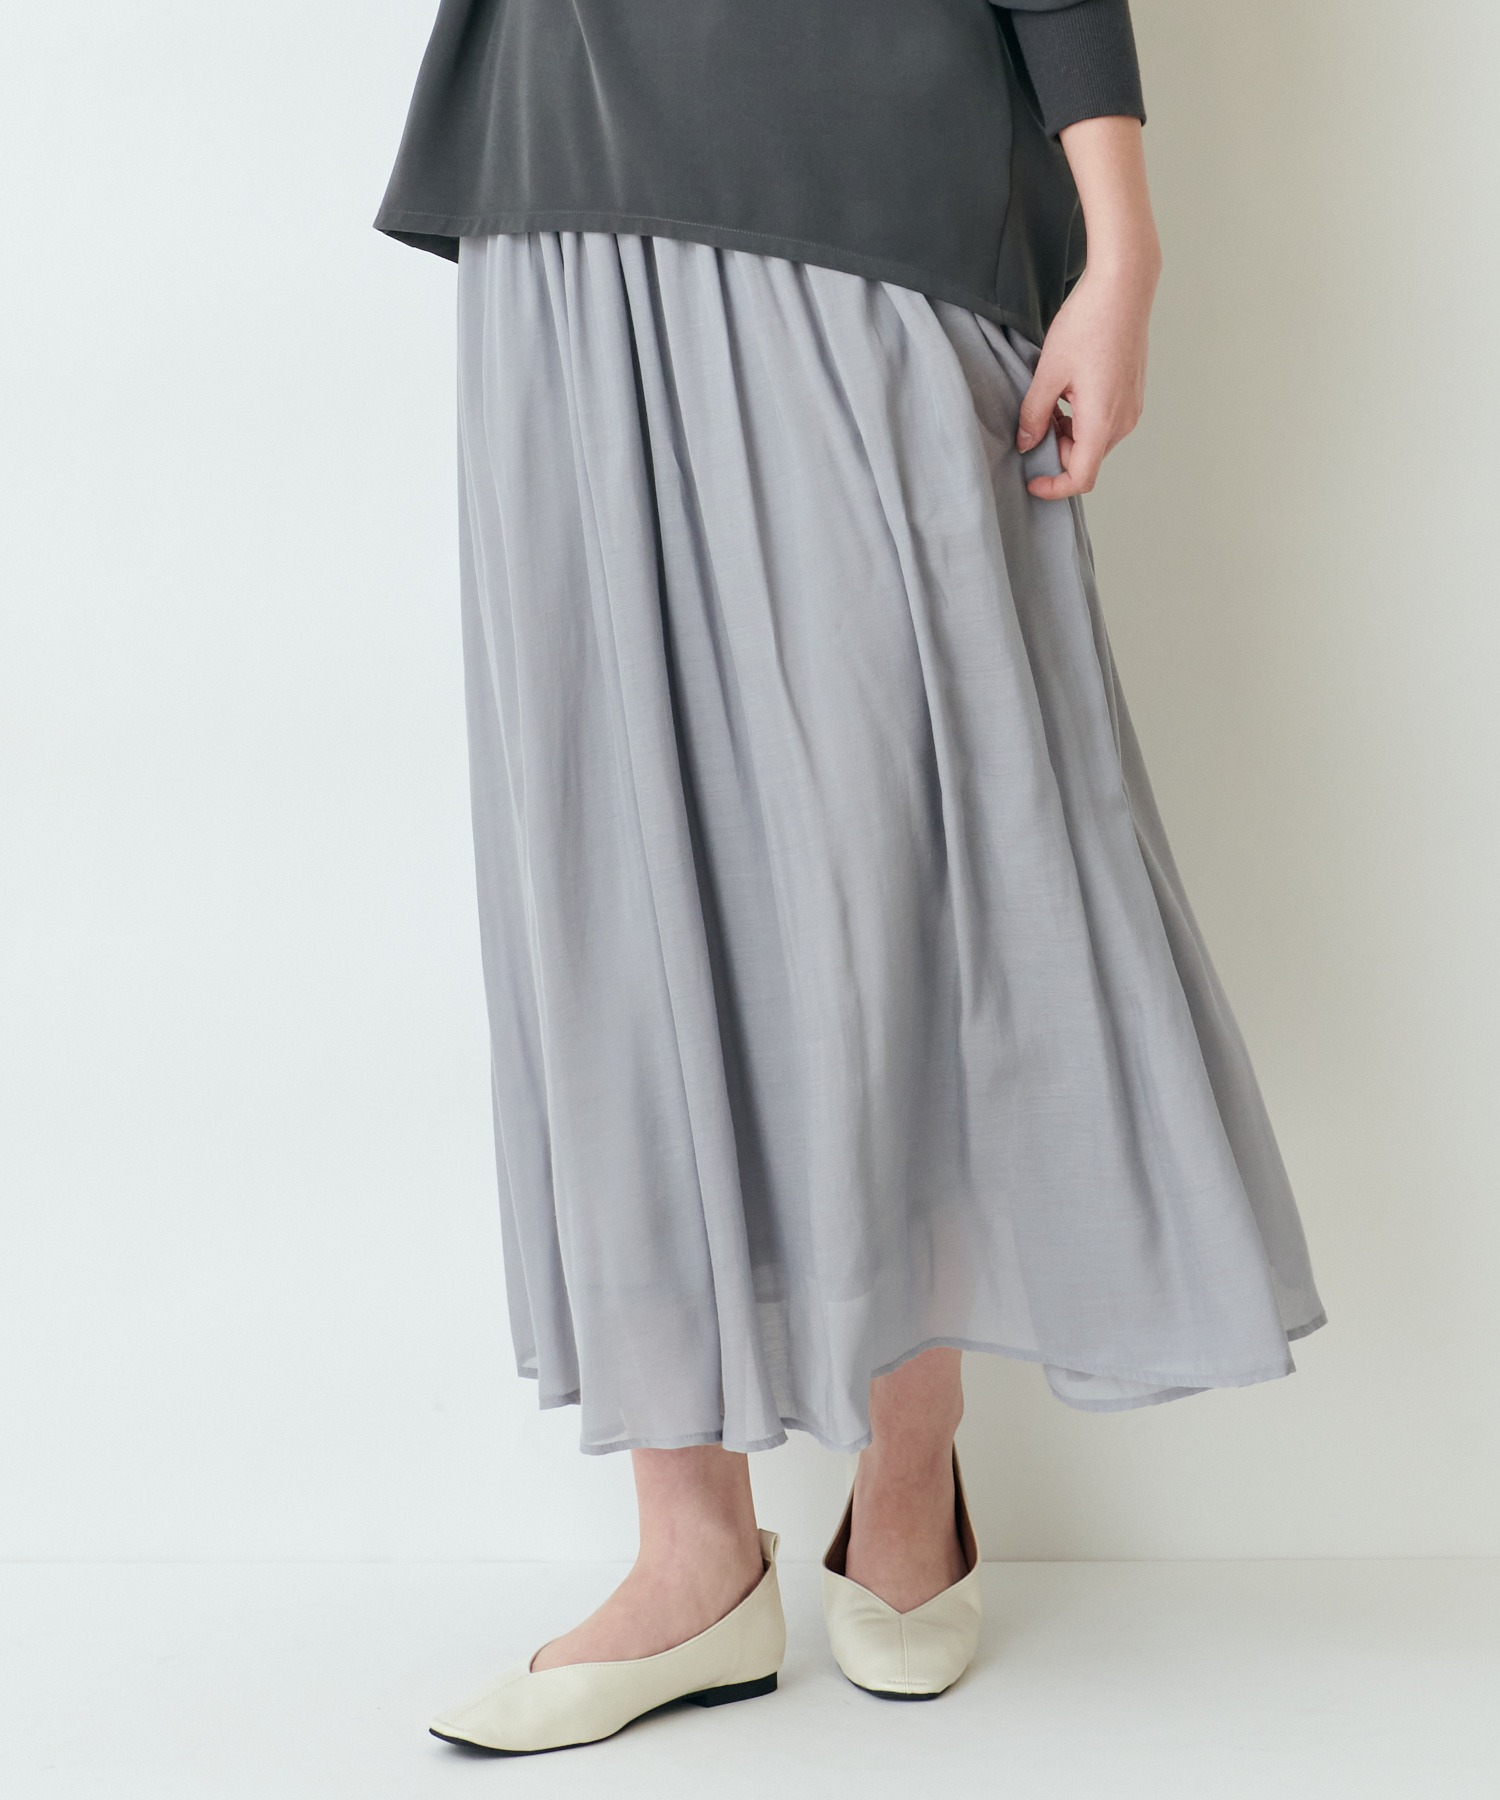 【THE CHIC】レーヨンマキシスカート